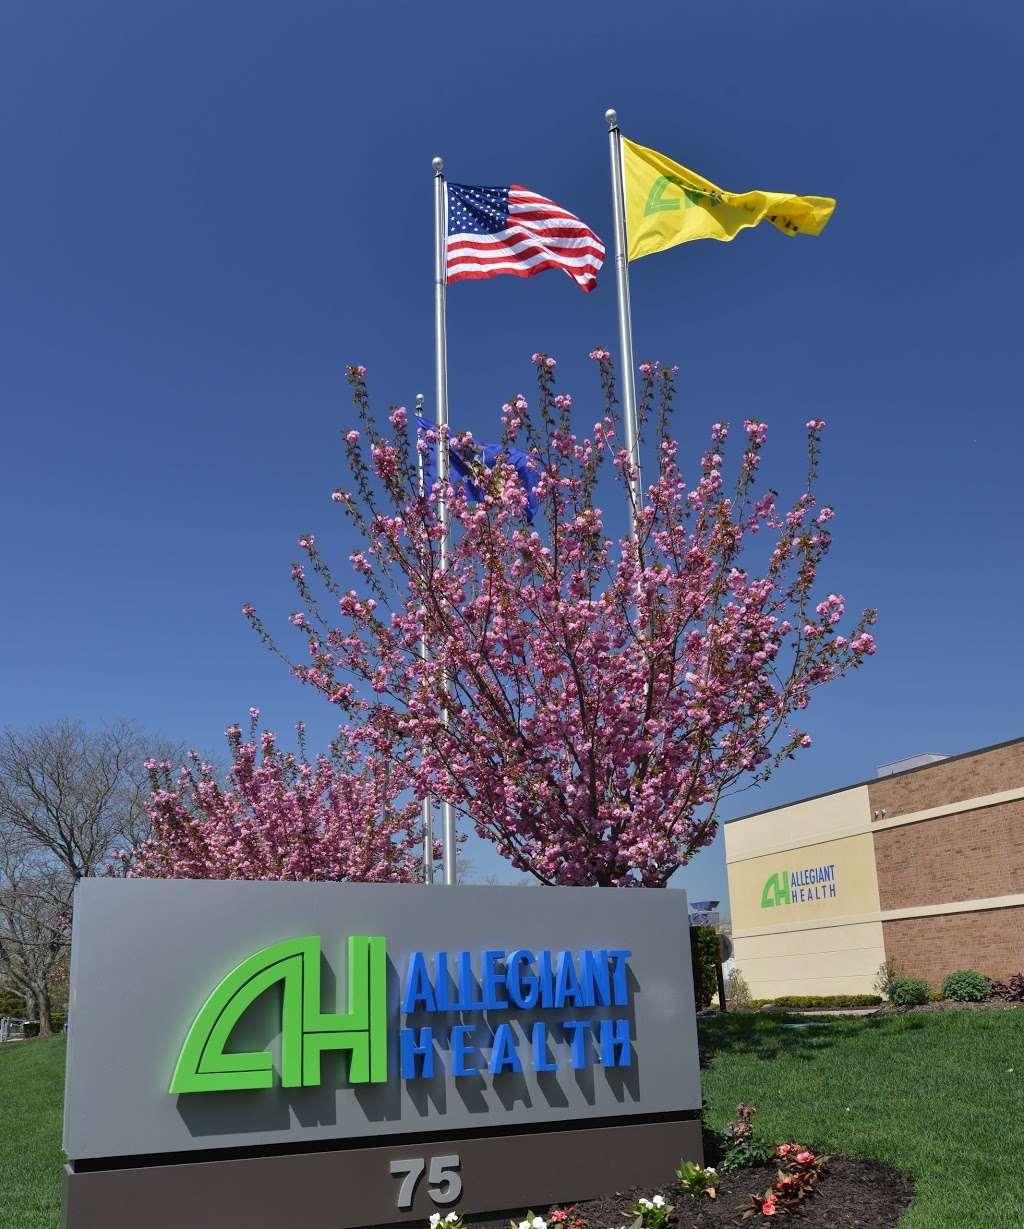 Allegiant Health - health  | Photo 7 of 7 | Address: 75 N Industry Ct, Deer Park, NY 11729, USA | Phone: (631) 940-9000